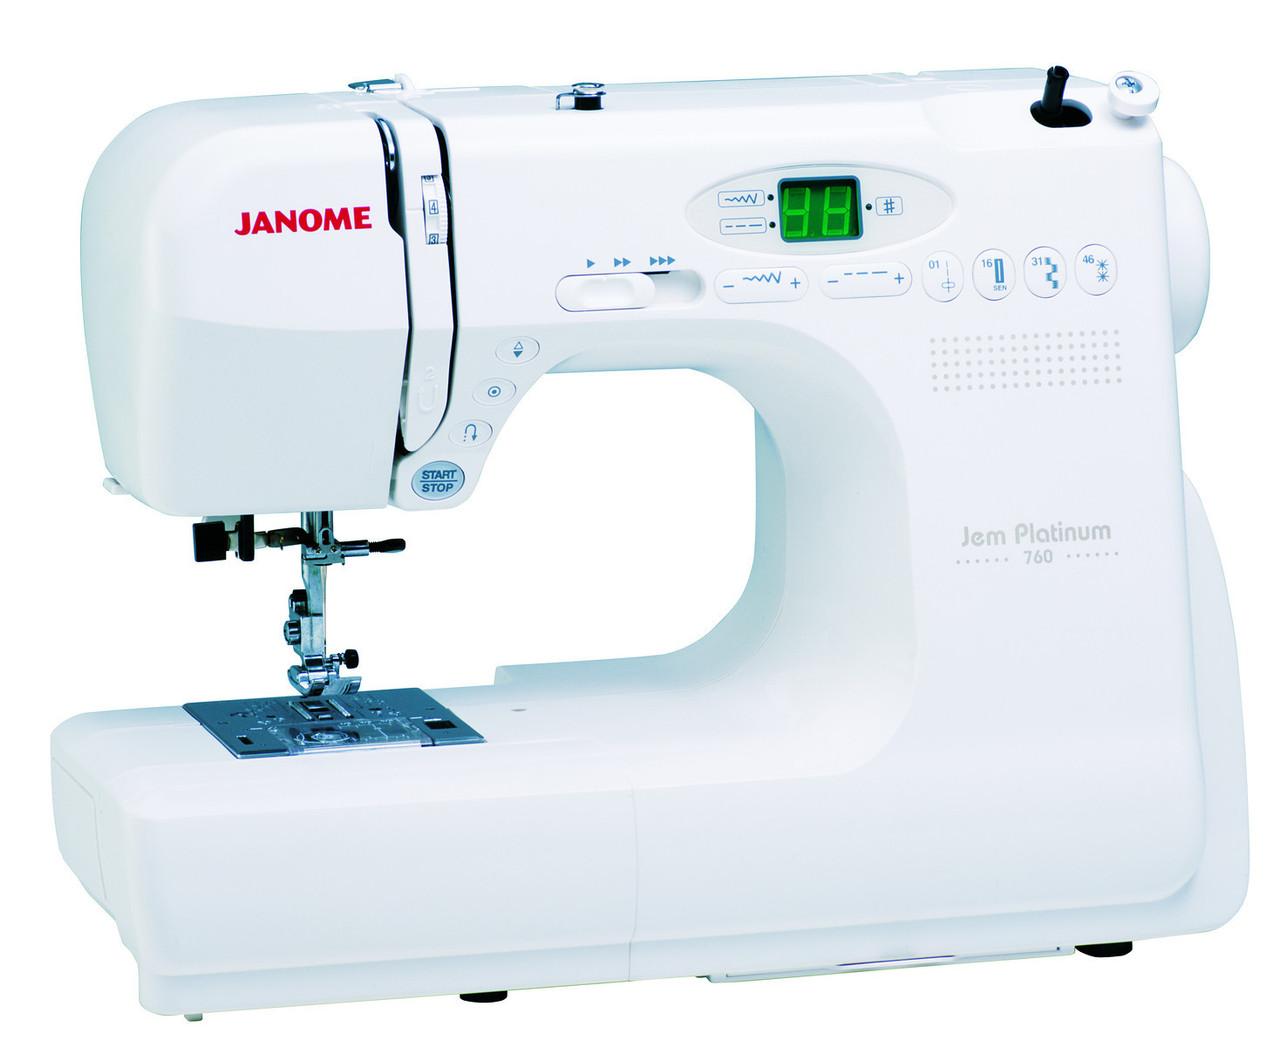 Janome 760 Jem Platinum